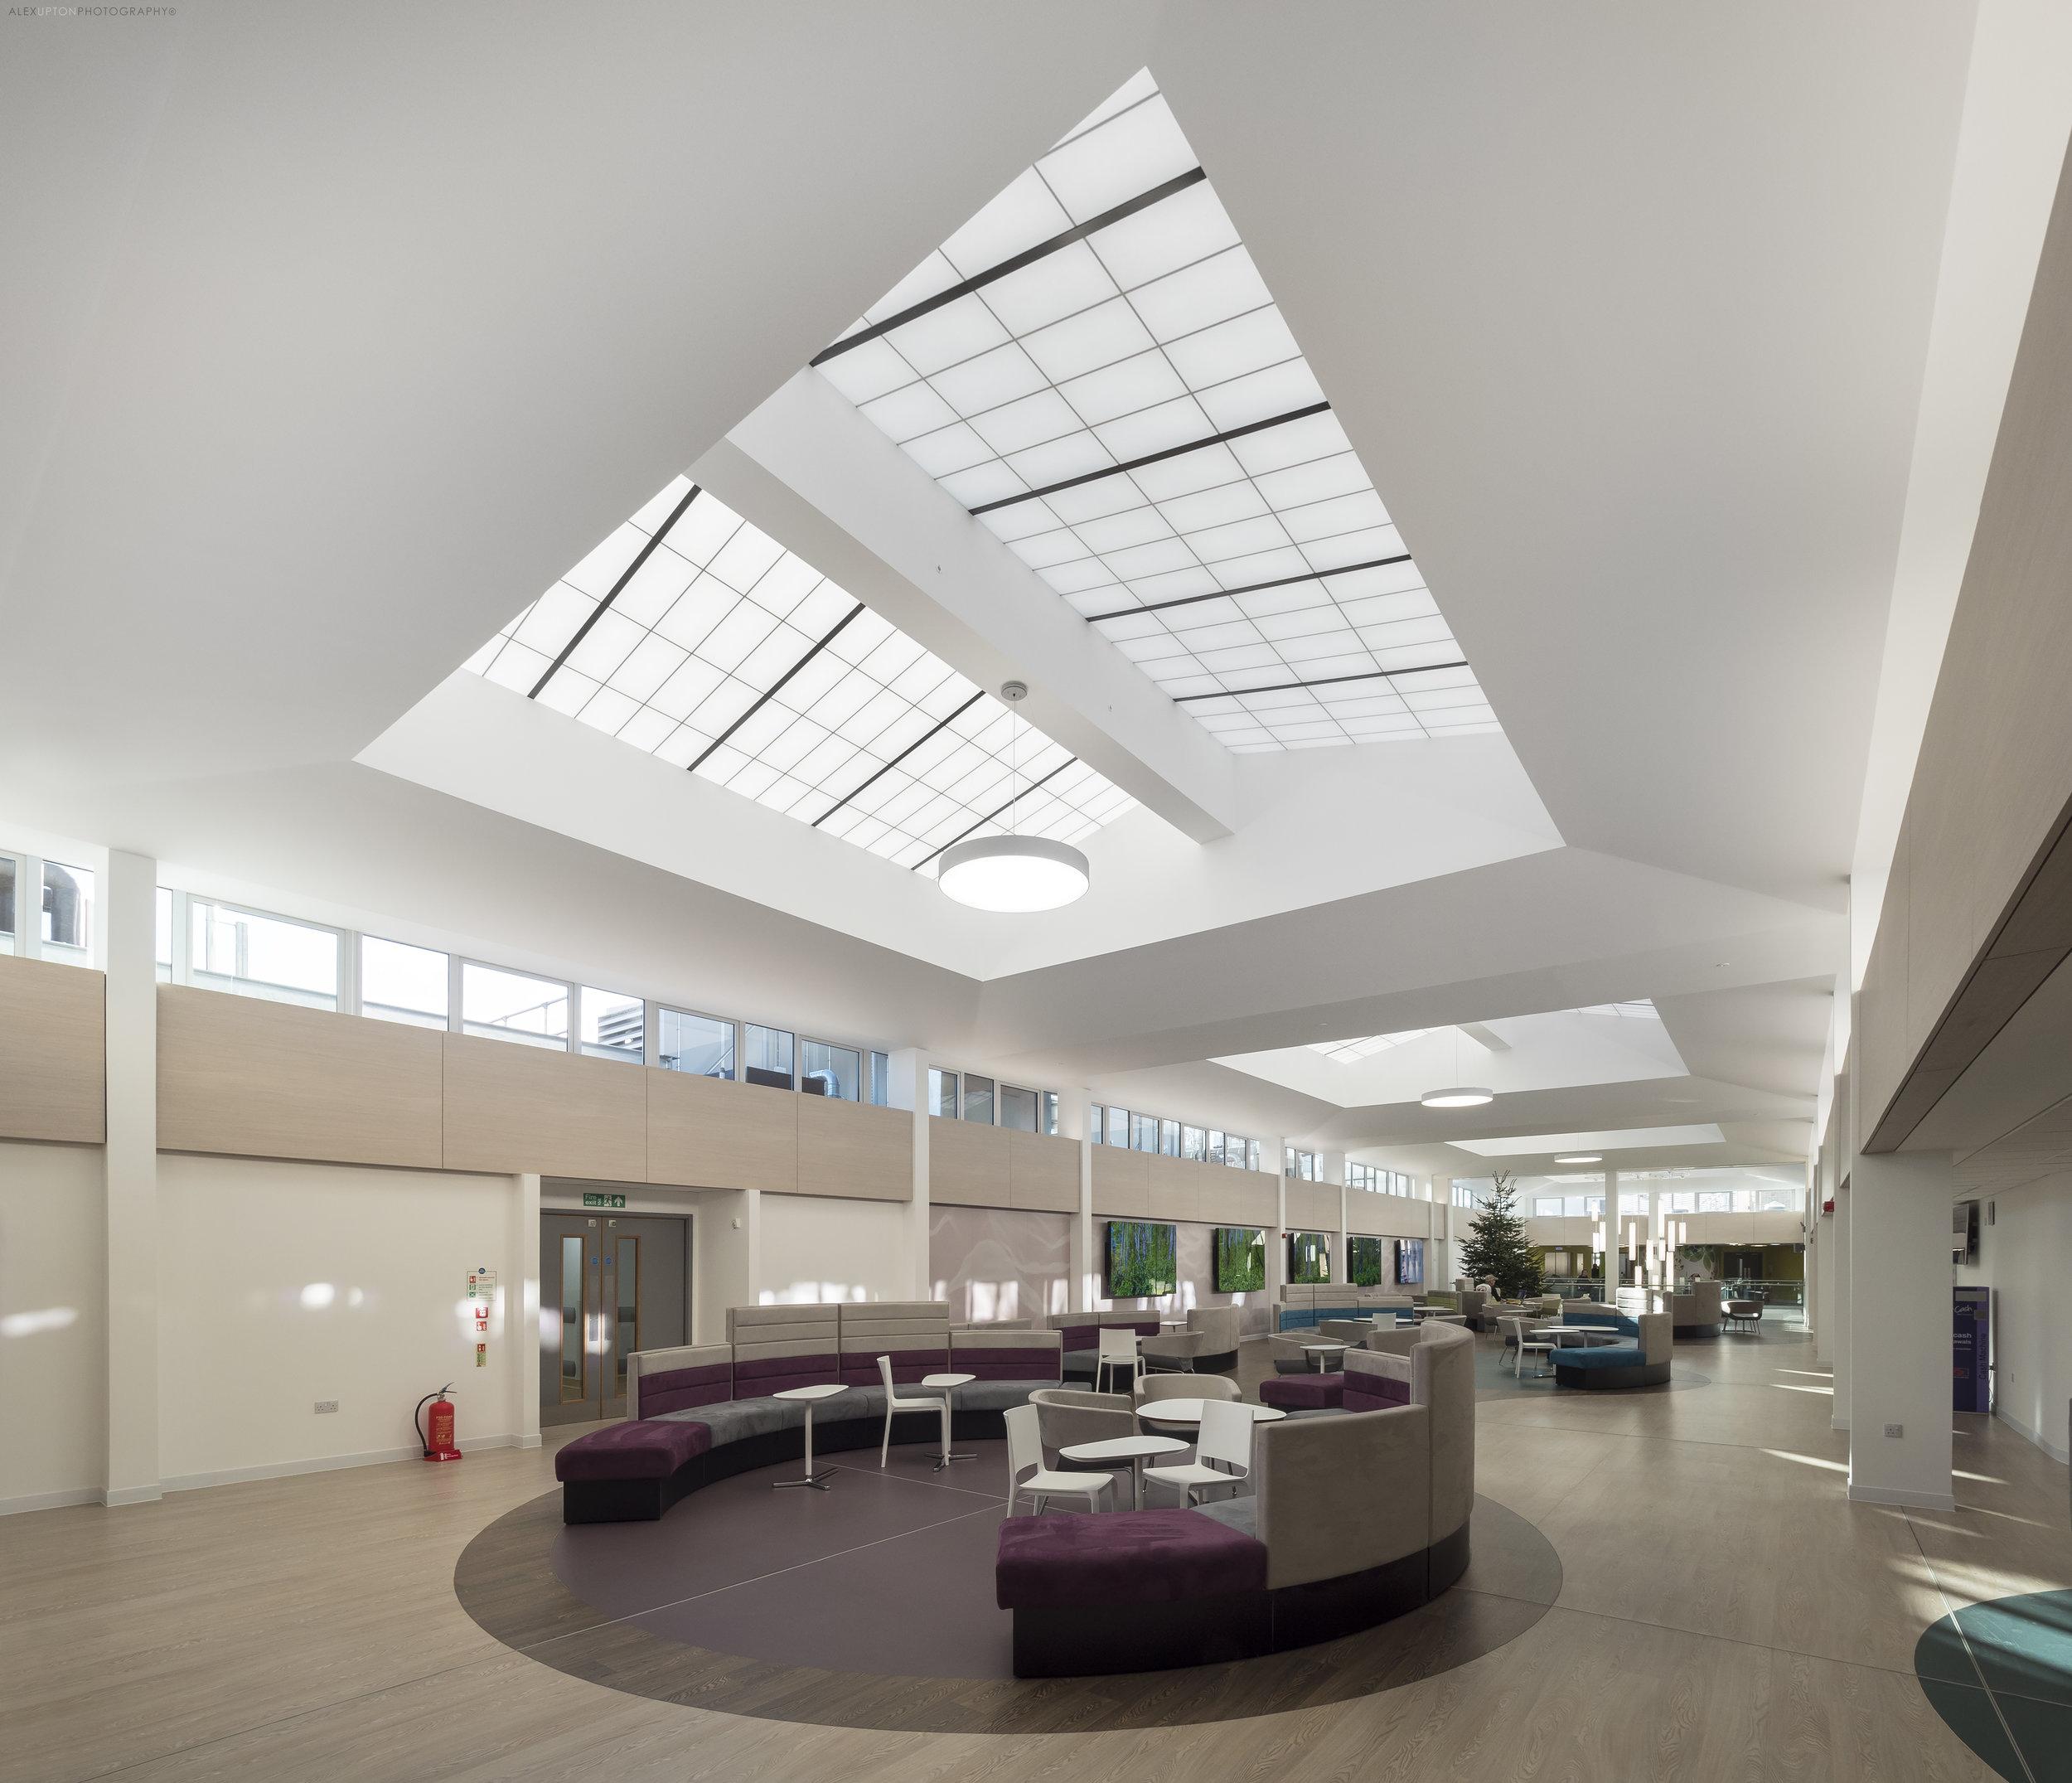 Benenden Hospital Waiting Room